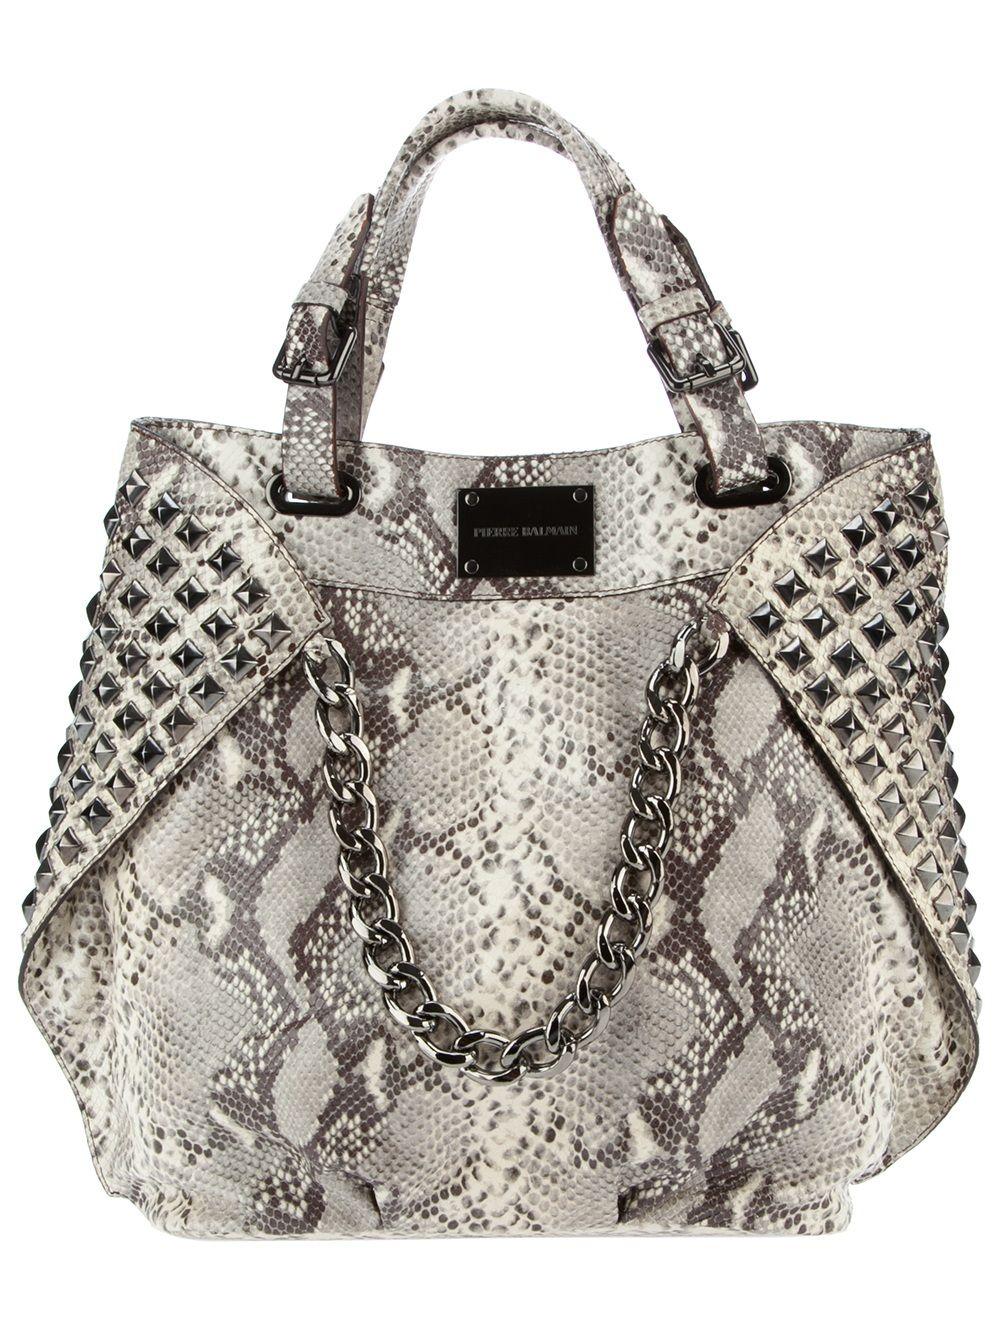 27be86af91 Pierre Balmain studded snakeskin bag | Get in my closet | Bags ...